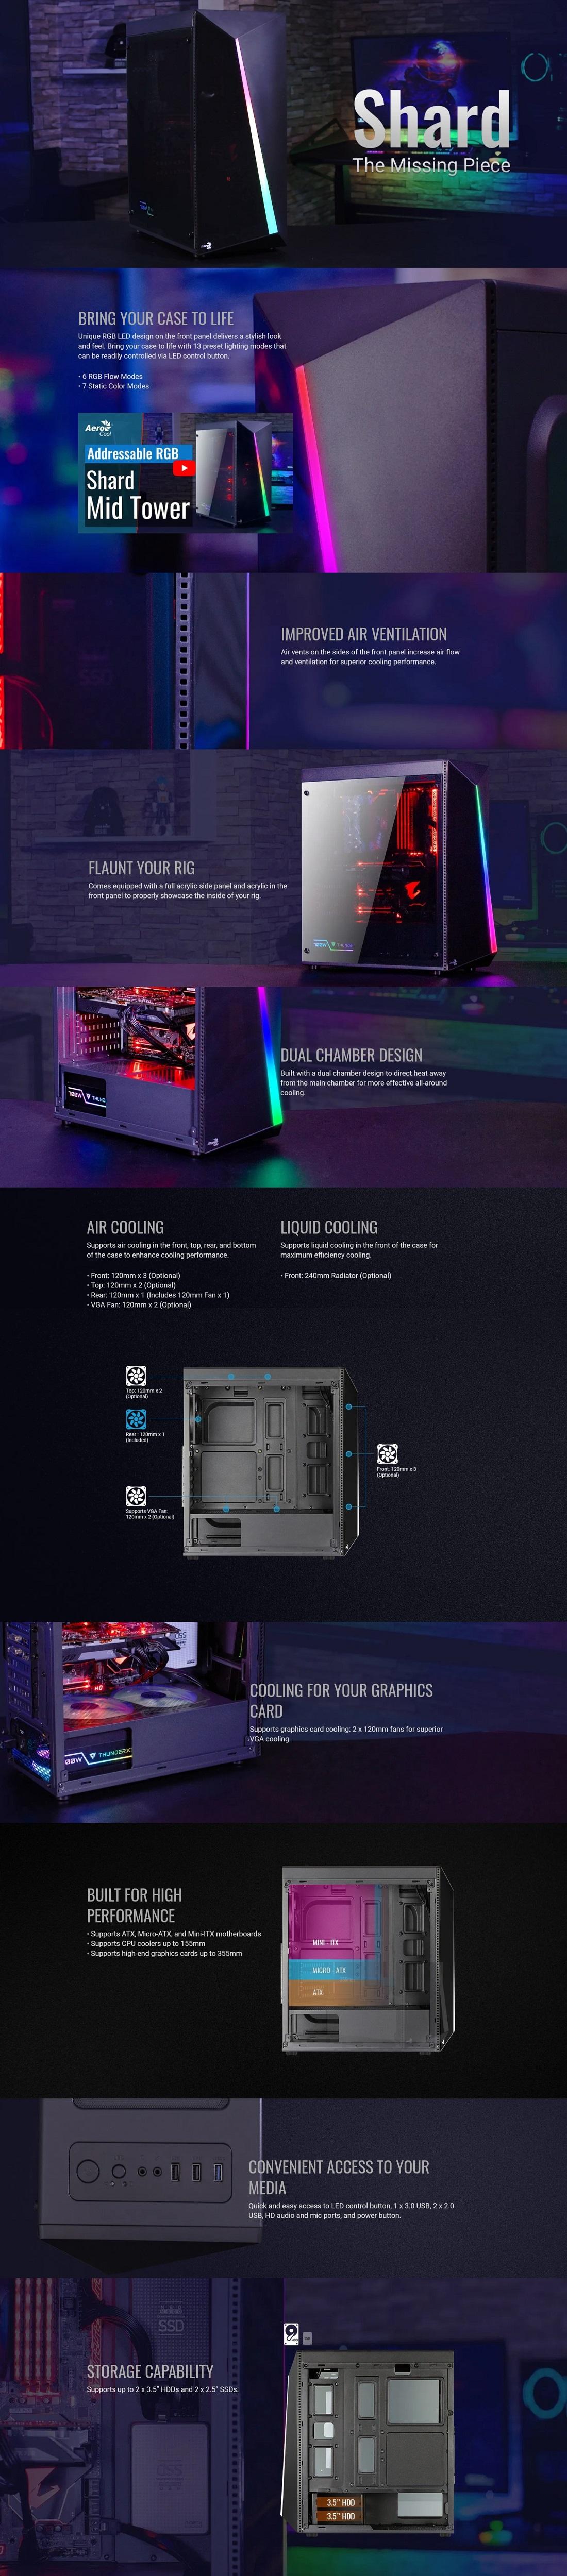 Aerocool Shard RGB Mid Tower PC Case Stylish Acrylic Panel 13 Lighting Modes